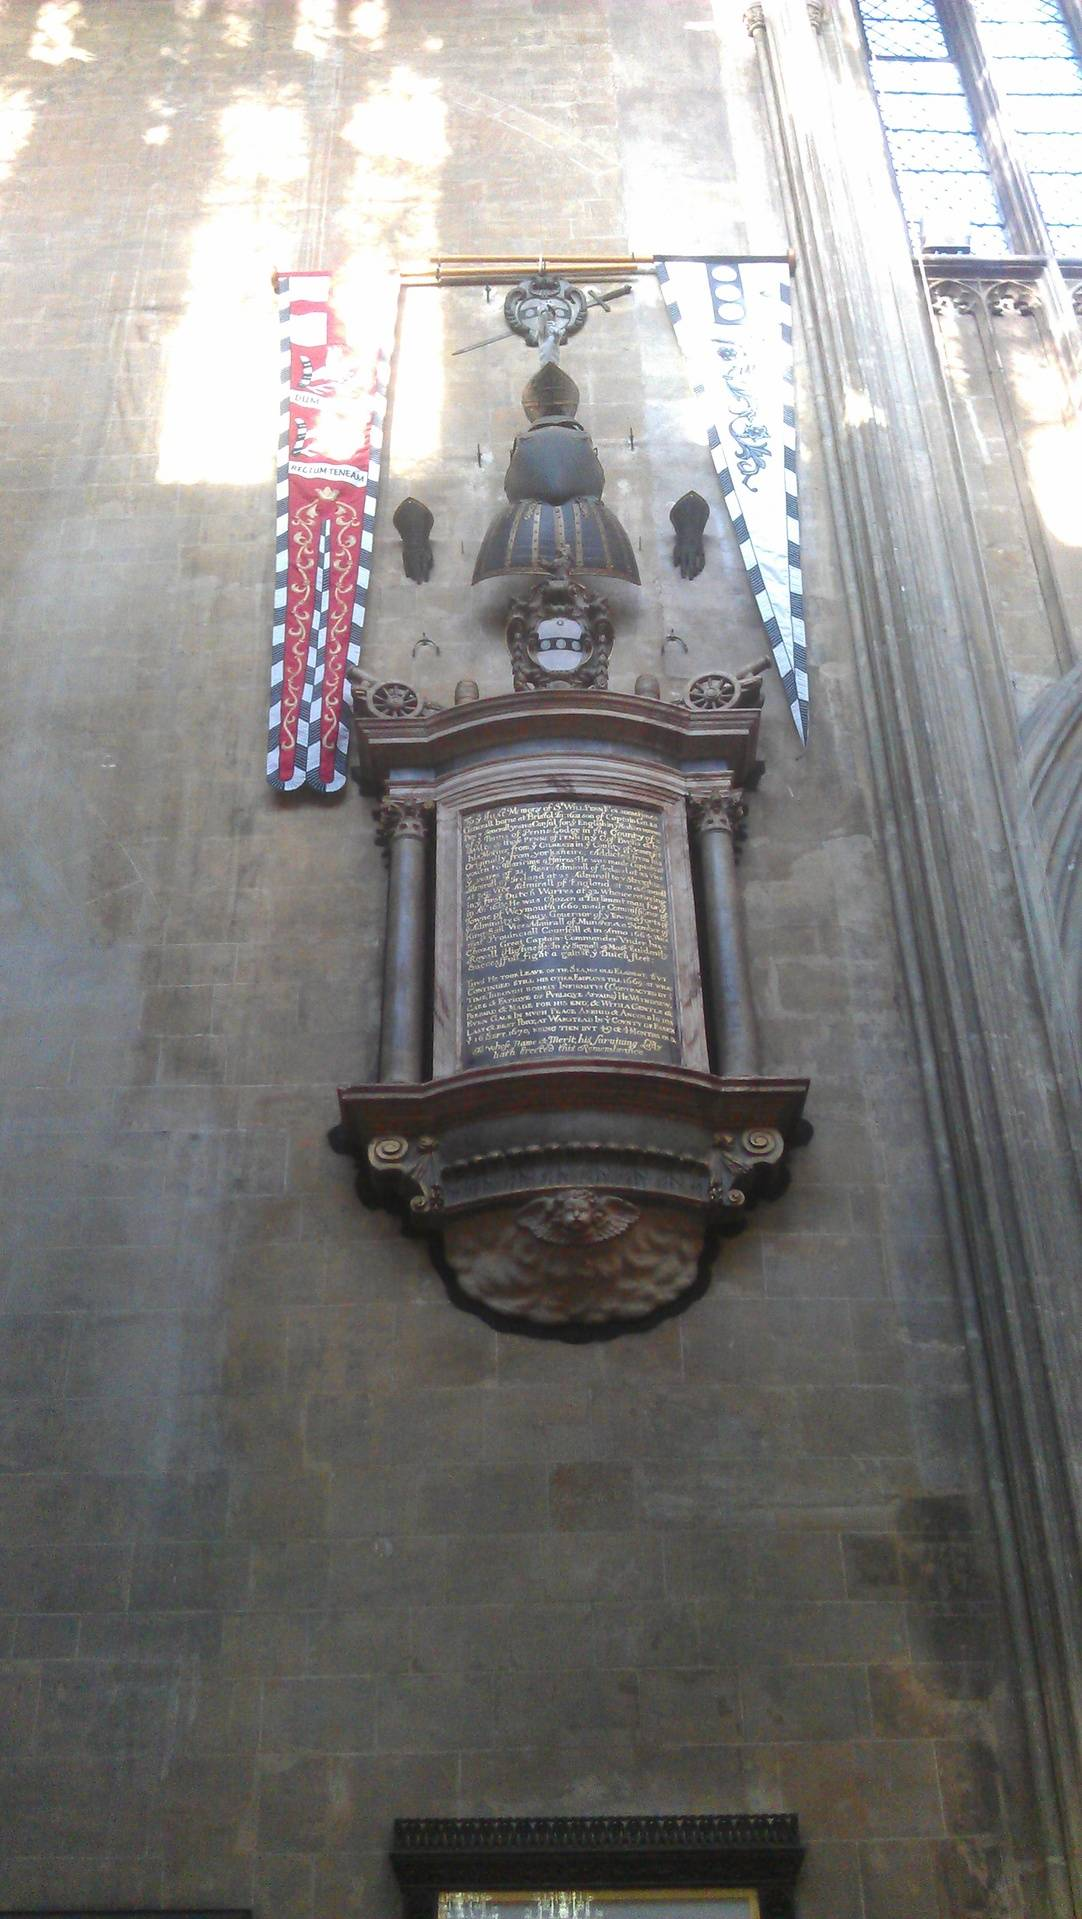 Memorial to Sir William Penn